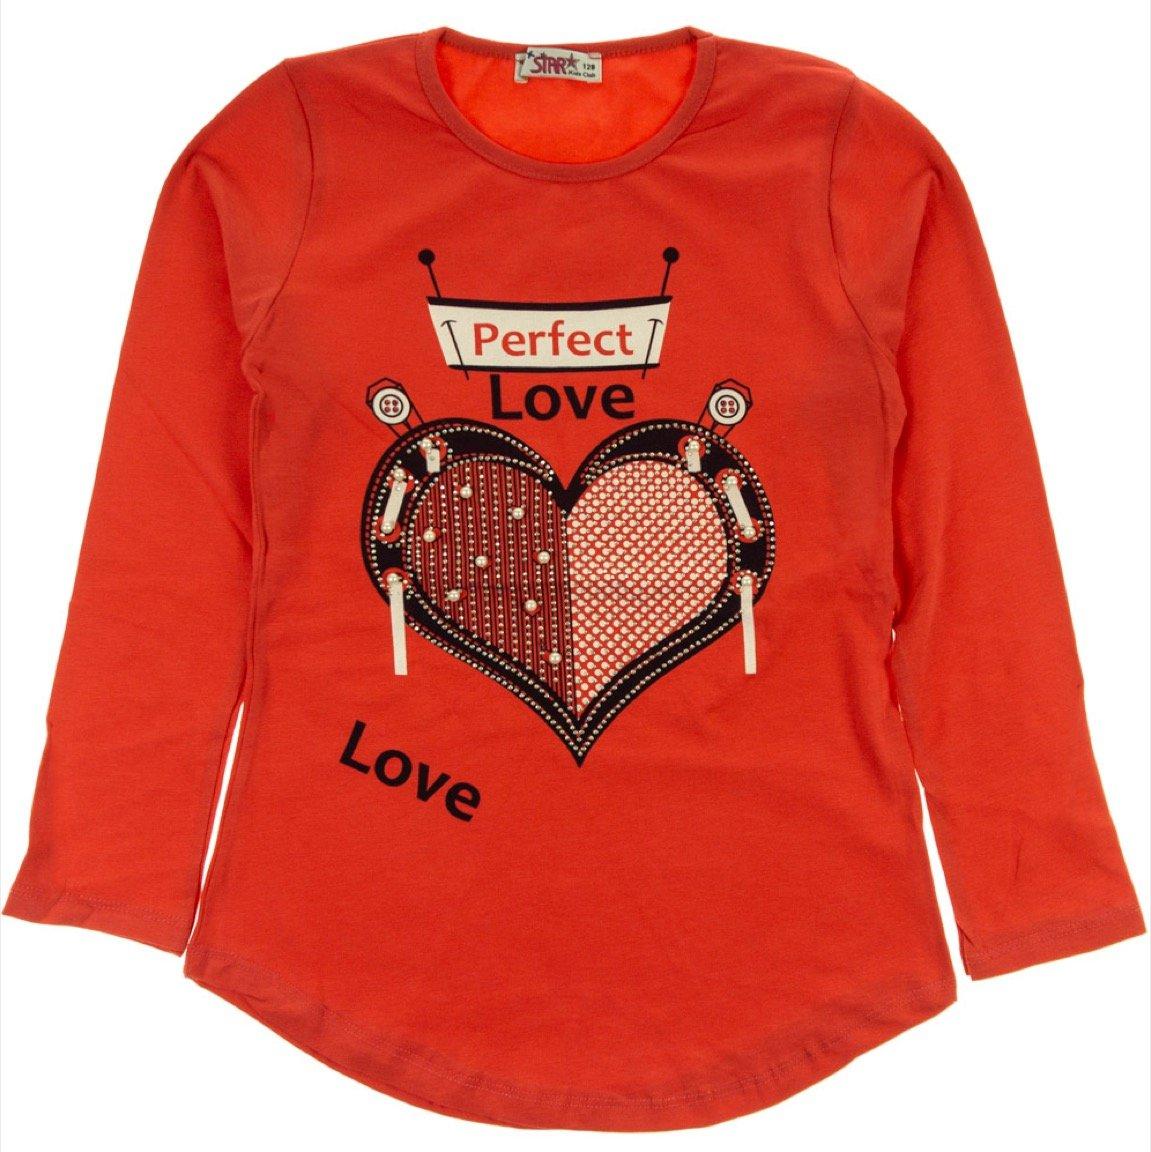 Mix Star παιδική εποχιακή μπλούζα «Perfect Love»